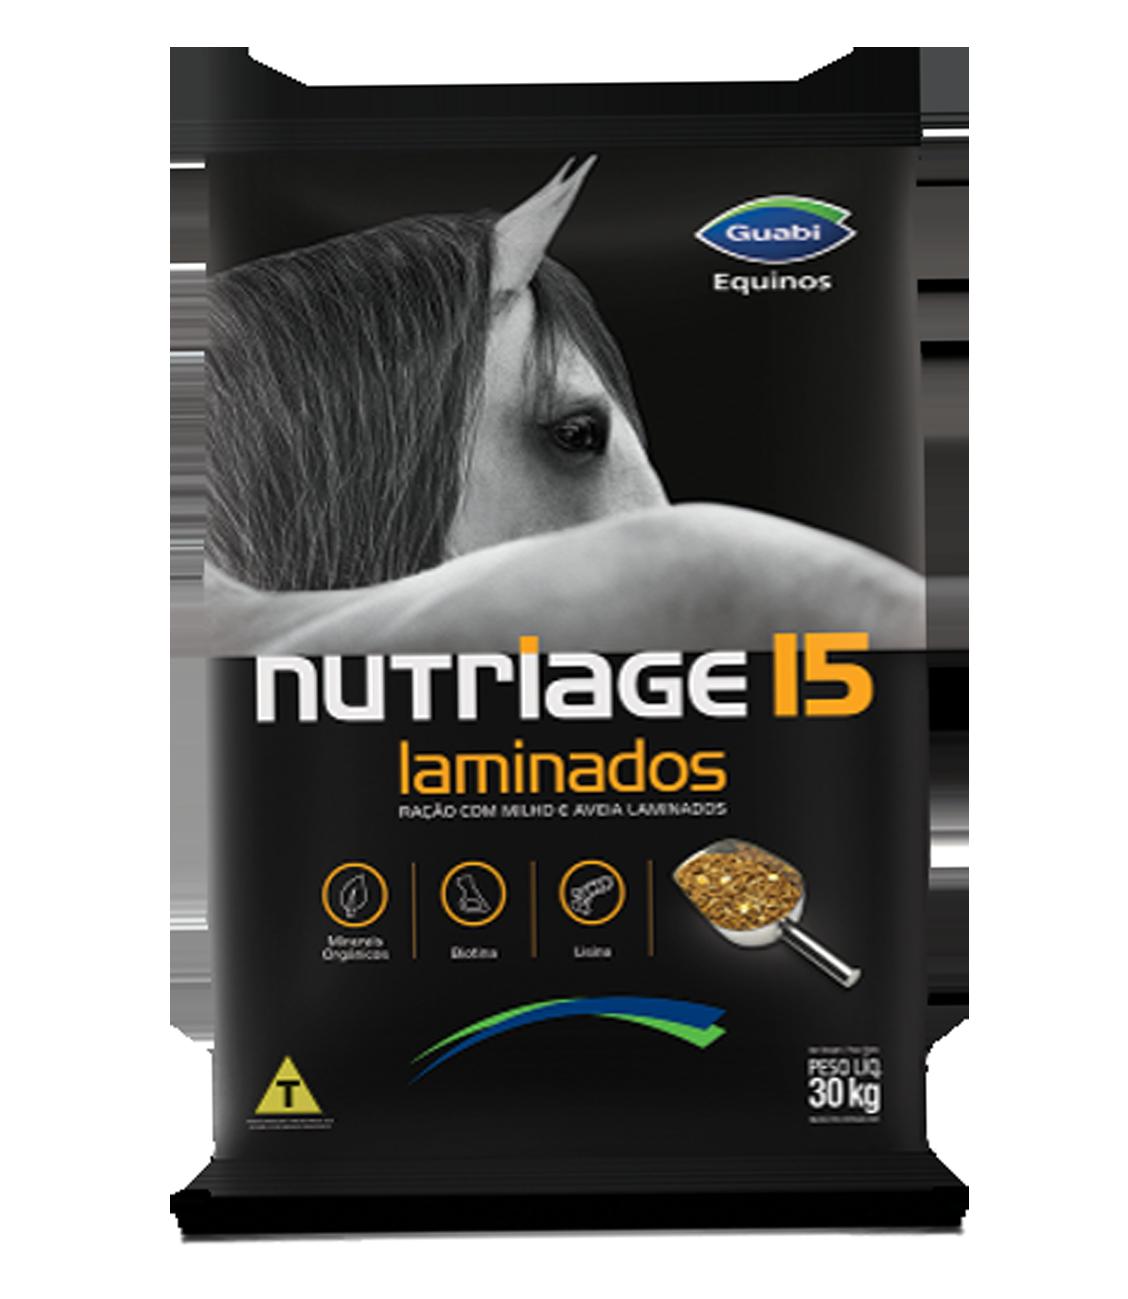 MOCK-UP-DIGITAL-NUTRIAGE-15-LAMINADOS-RGB-1128x1299